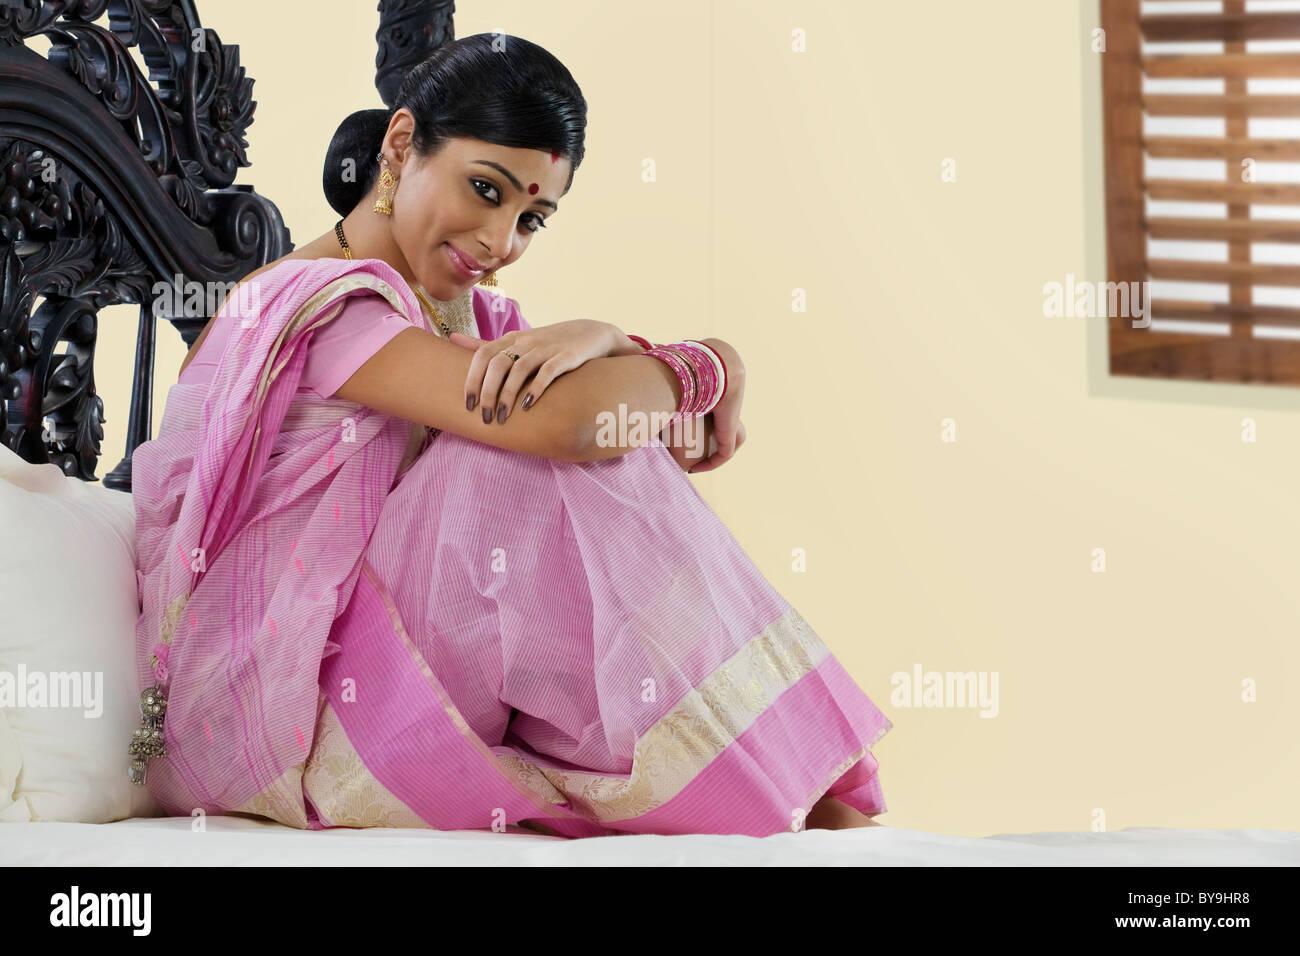 Portrait of a Bengali woman - Stock Image